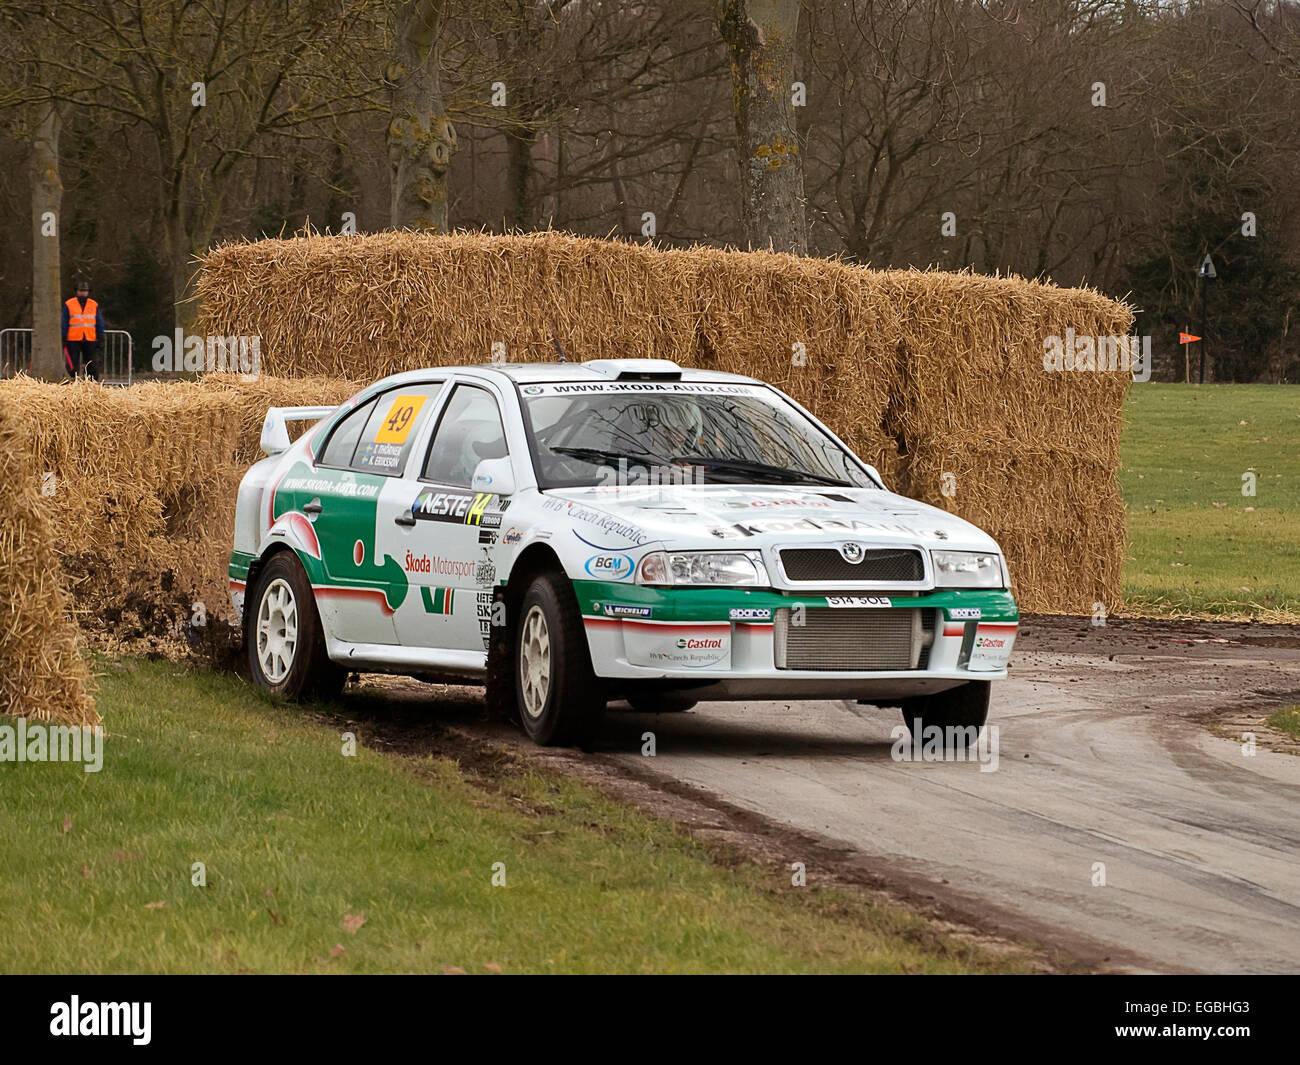 Warwickshire, UK. 21st Feb, 2015. Skoda Octavia Rally car on Race Retro special stage 21/02/2015 Credit:  Martyn - Stock Image